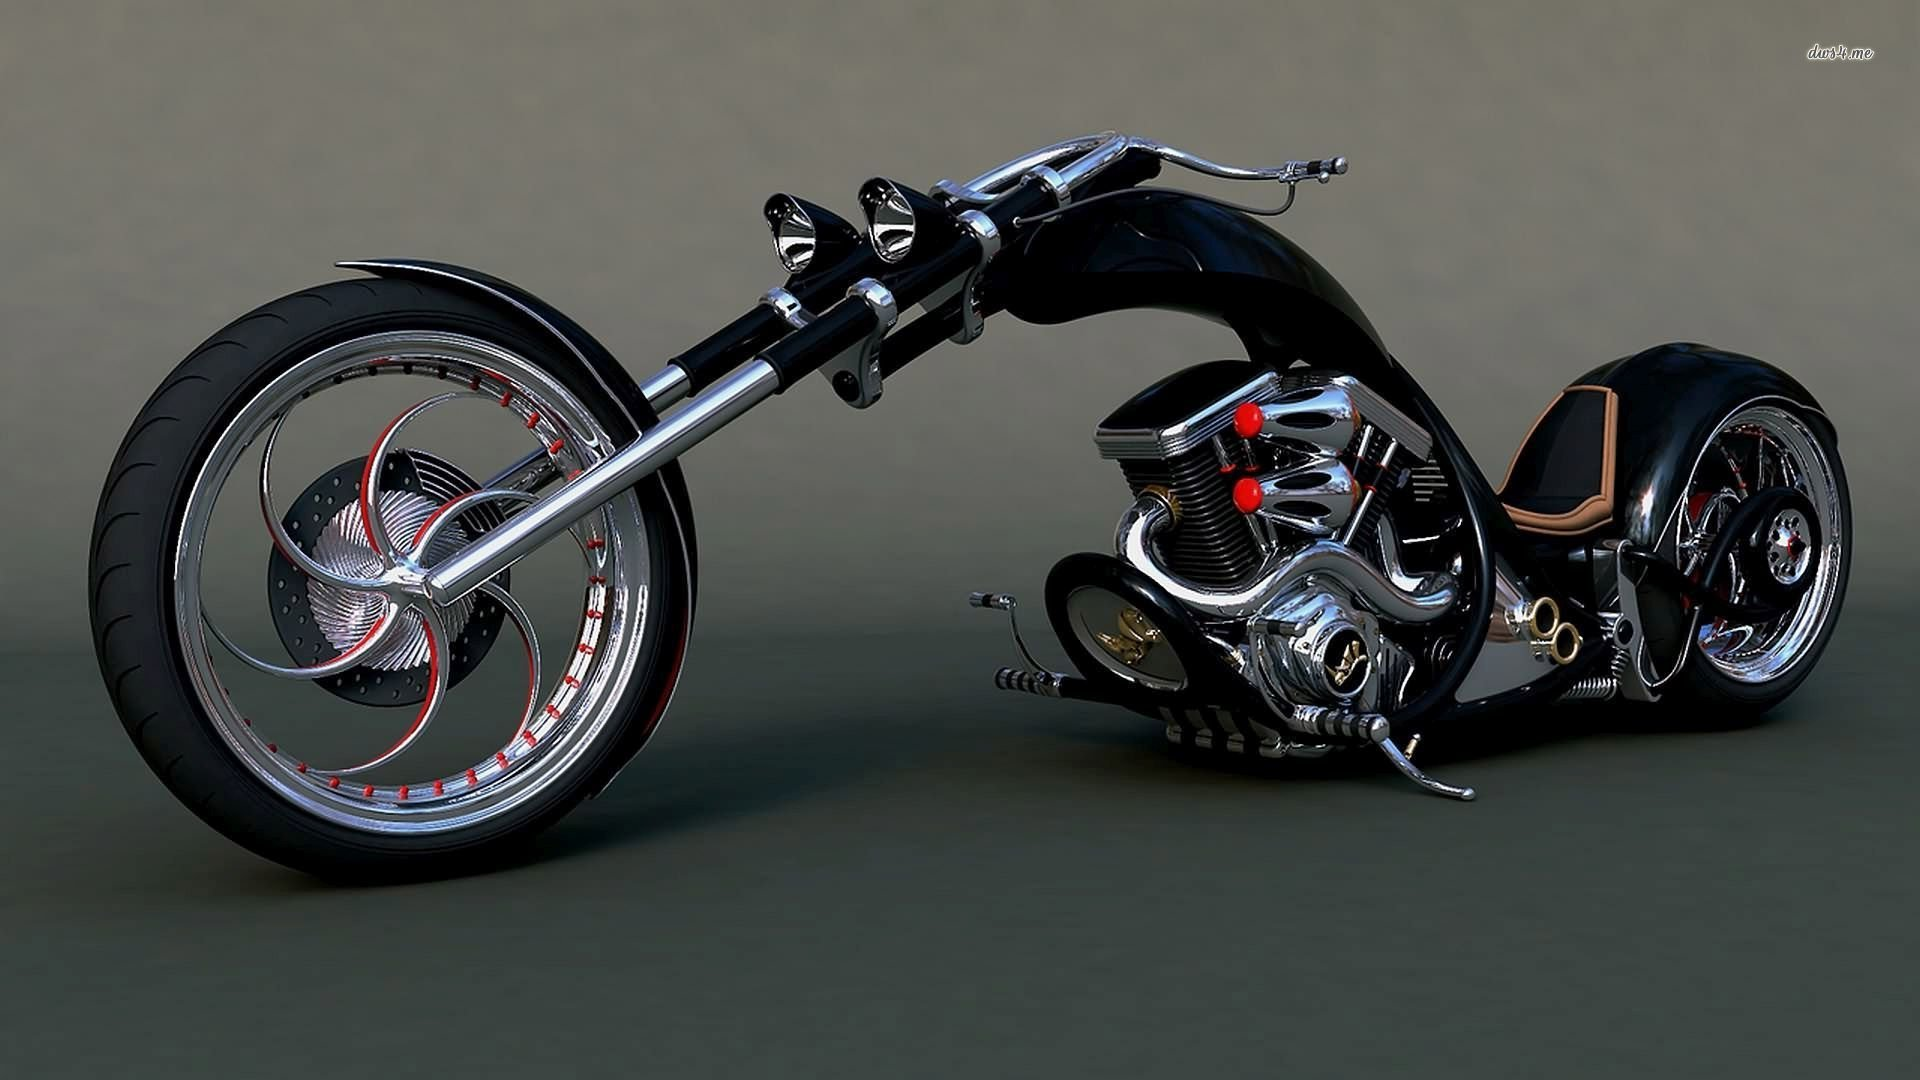 Chopper bike tuning motorbike motorcycle hot rod rods for Custom wallpaper